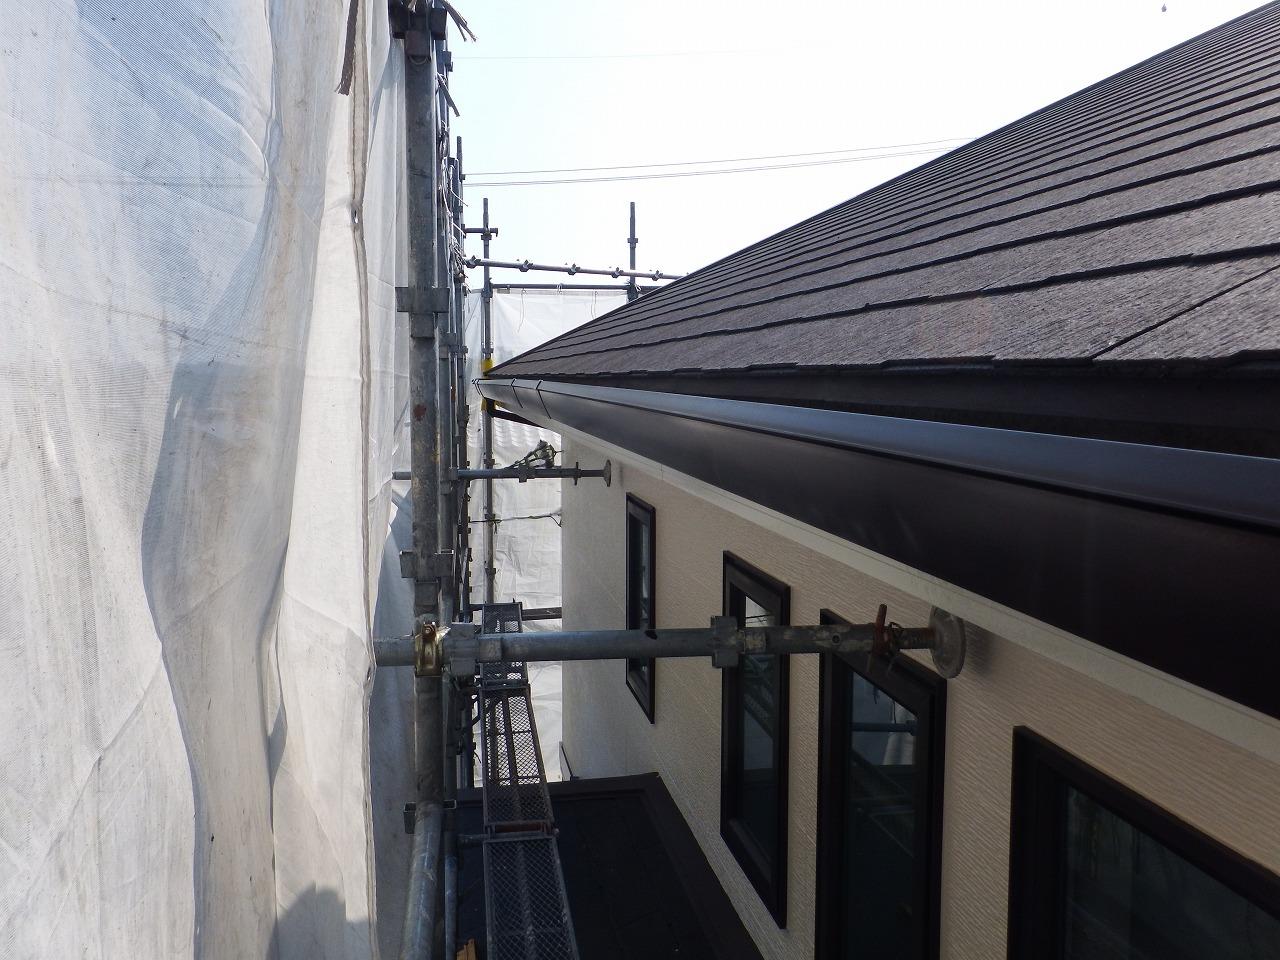 生駒市の外壁塗装工事現場で雨樋塗装